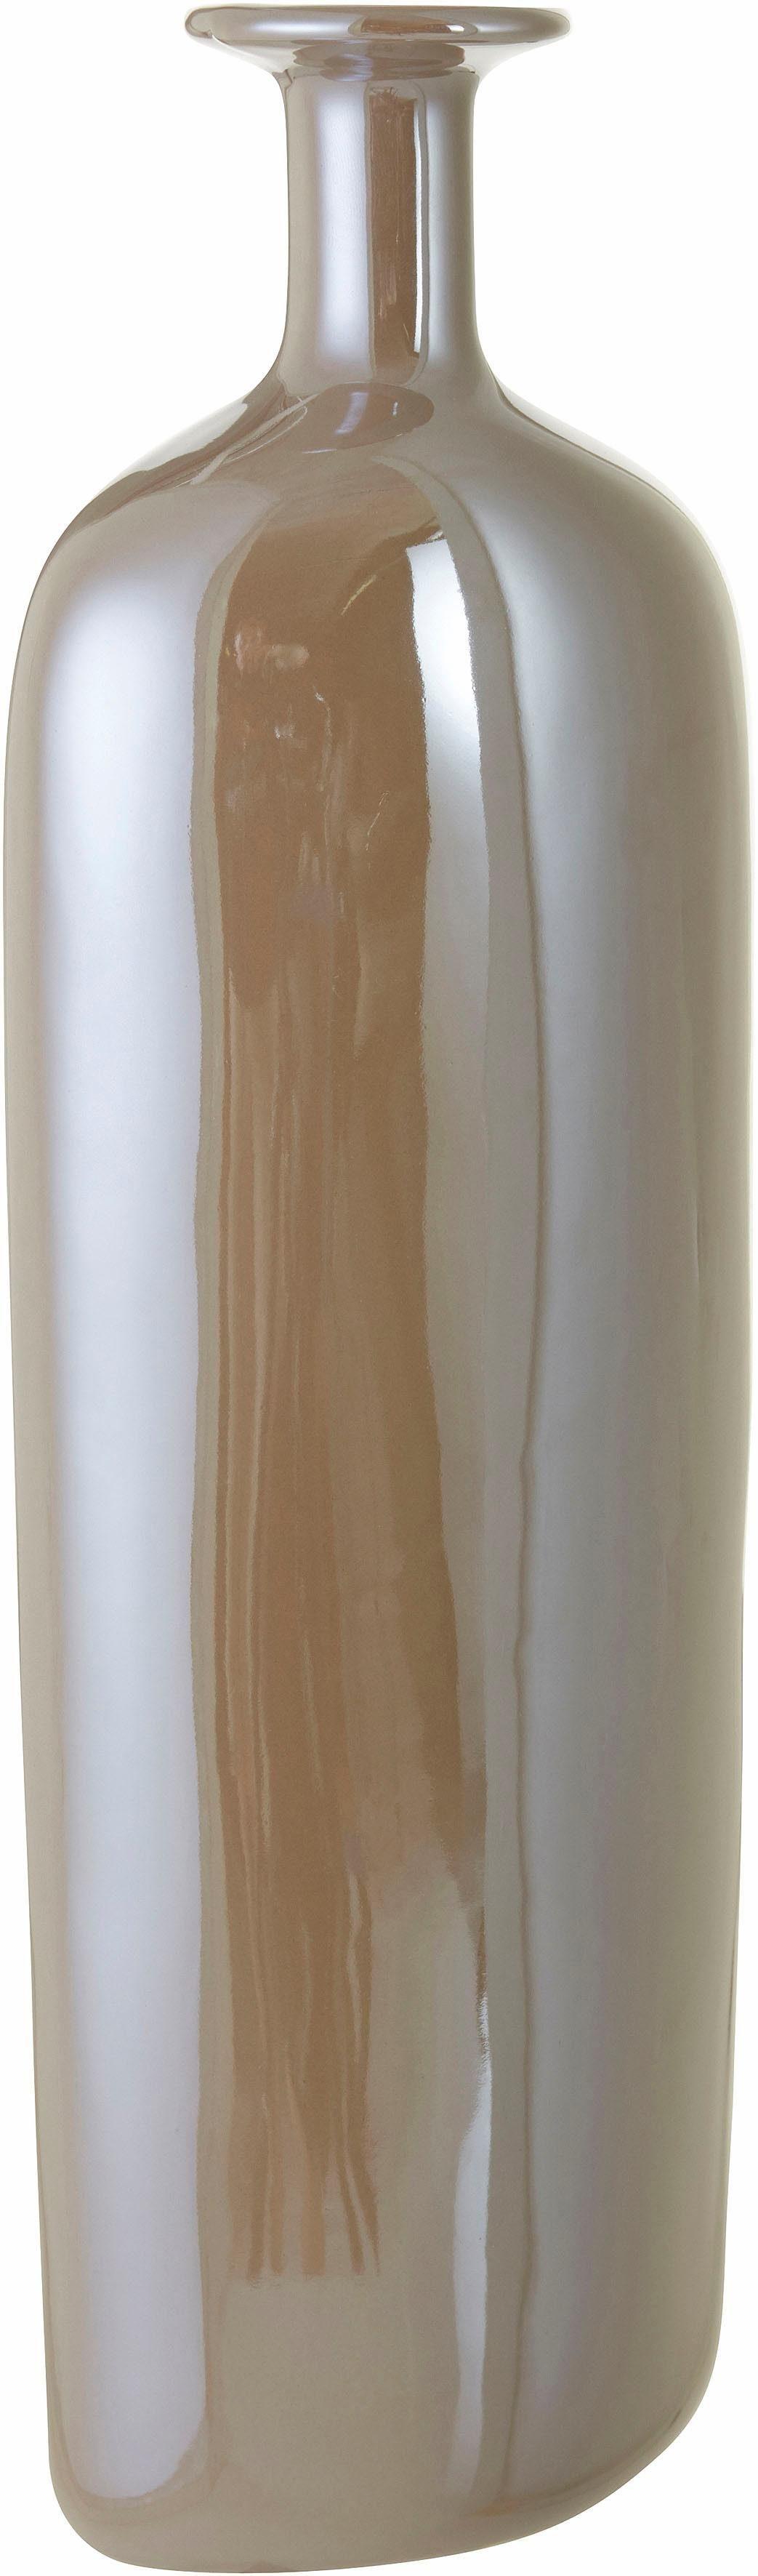 Home affaire Flaschenvase, Höhe 40 cm